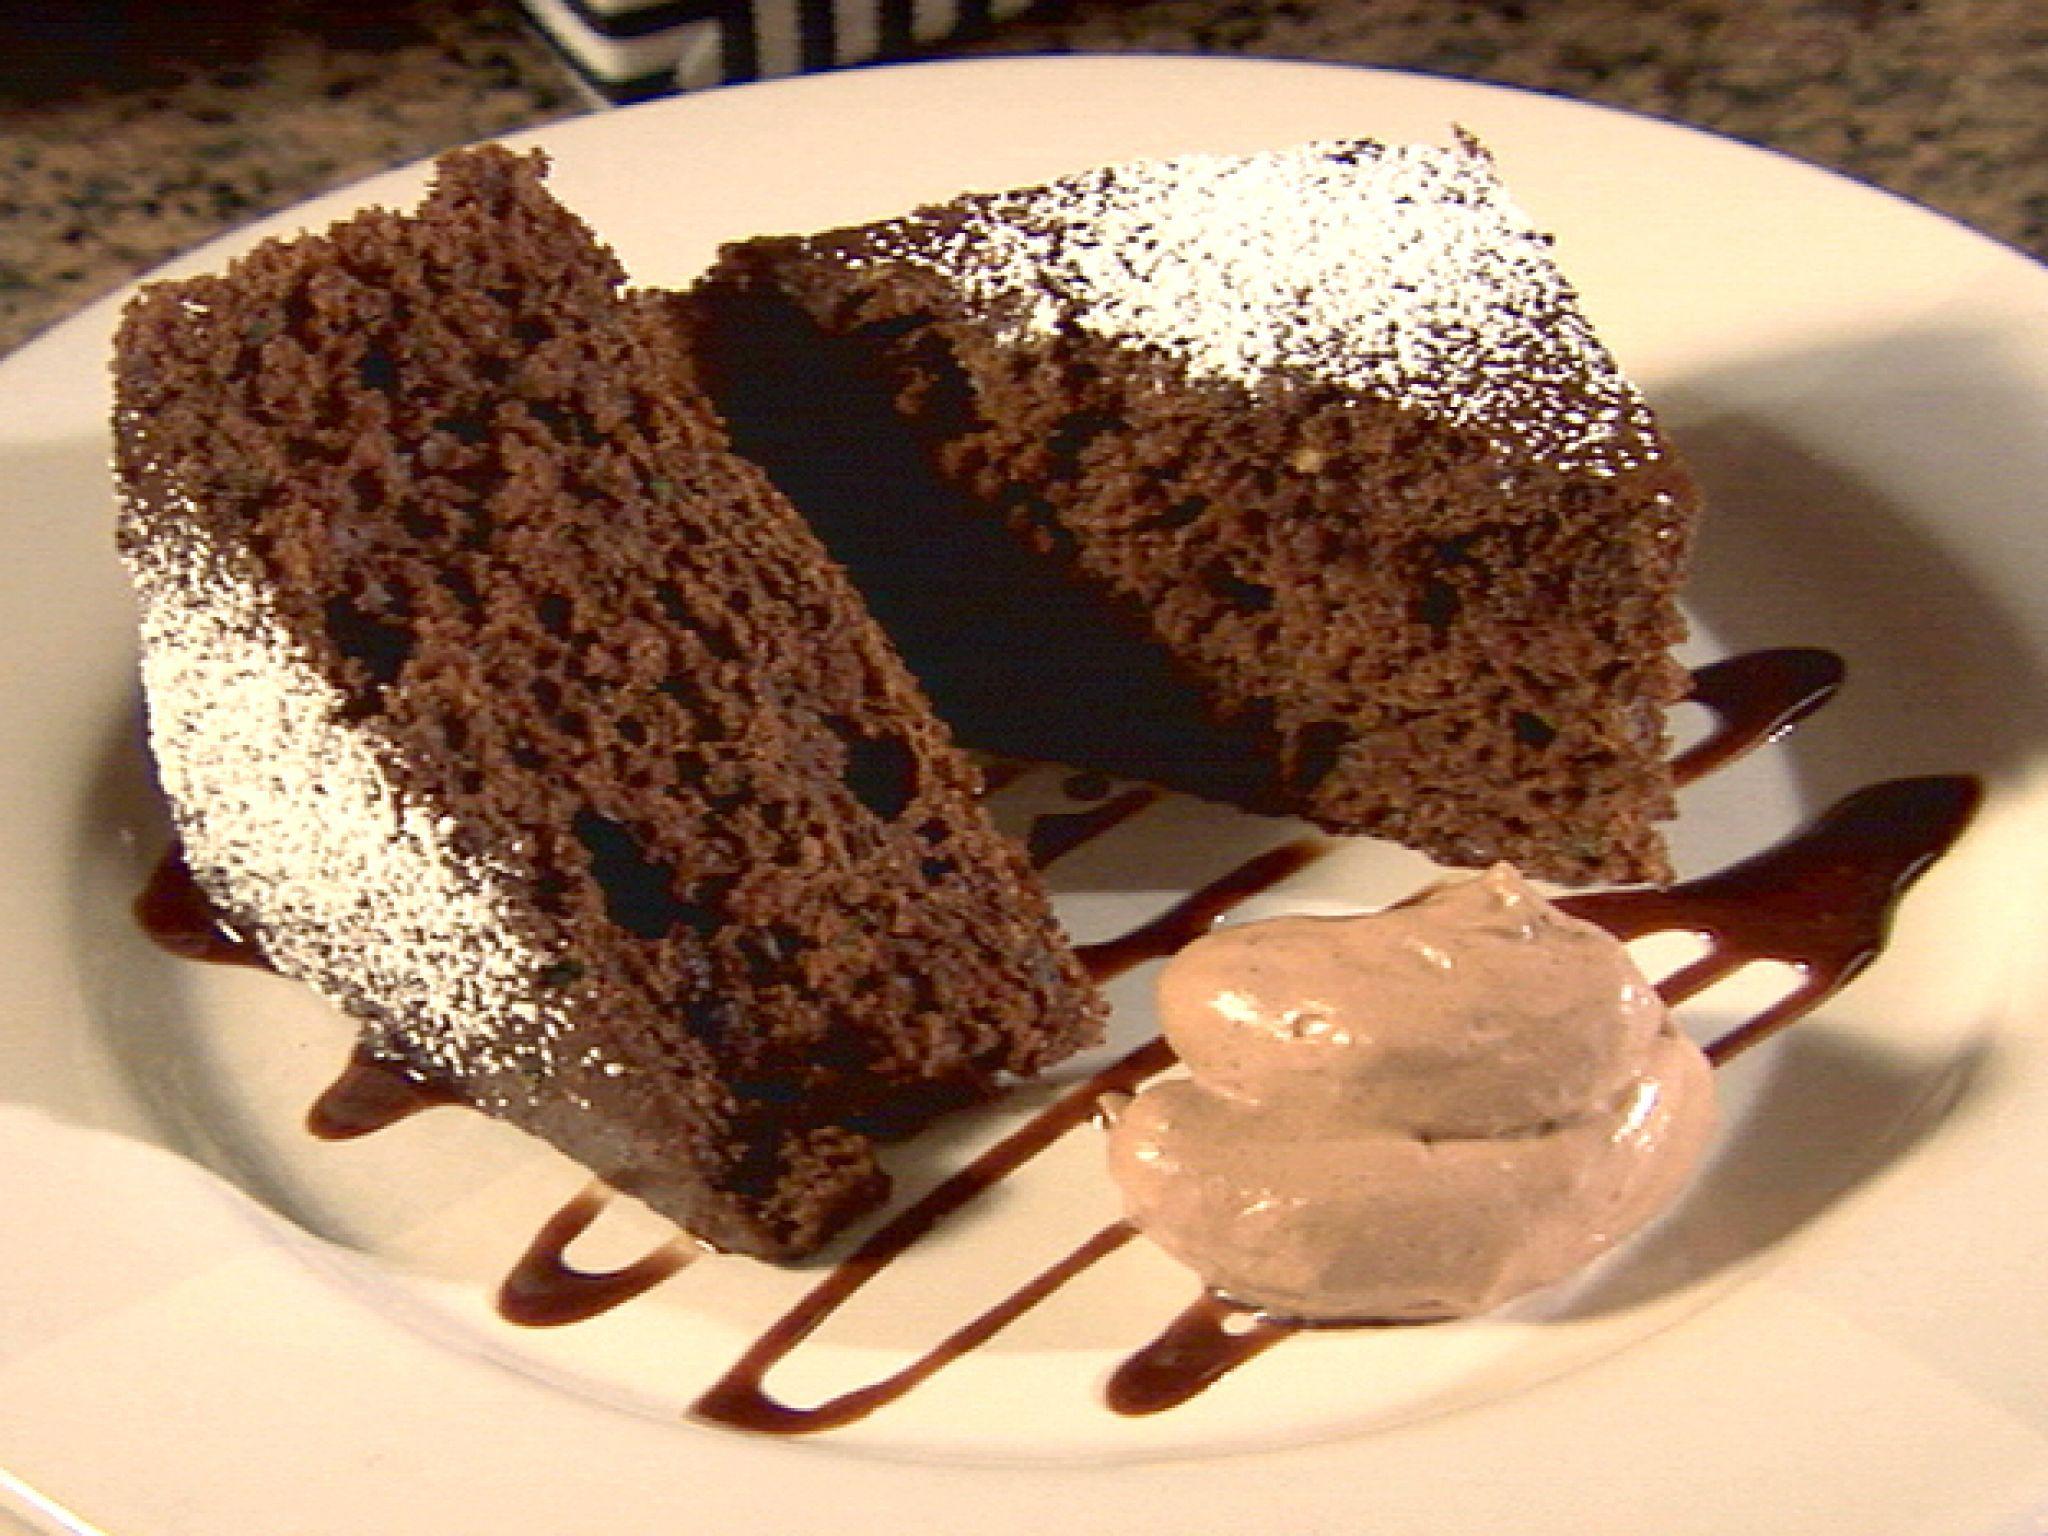 Torta al cioccolato vegana: la video ricetta